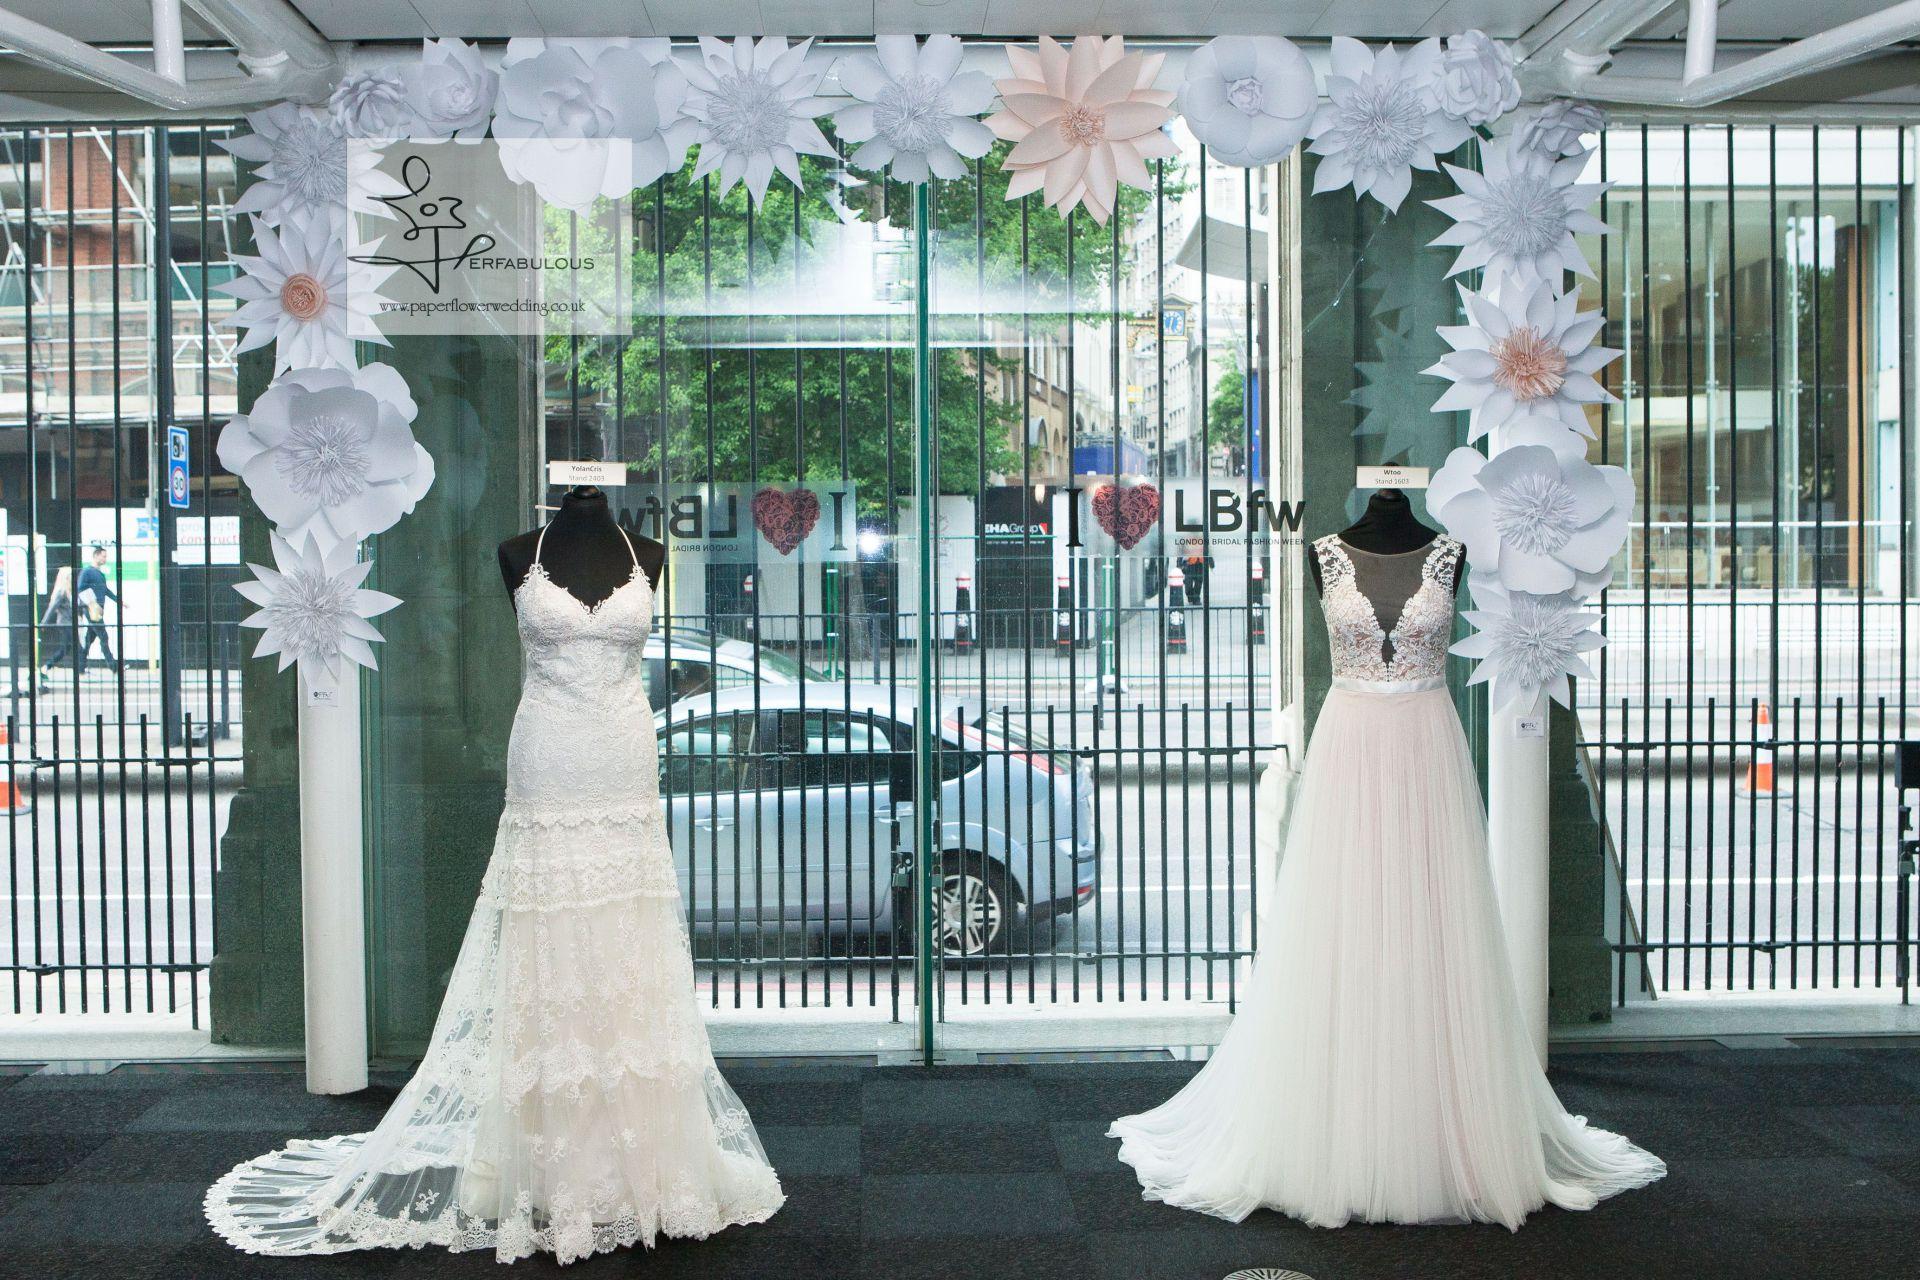 oversized paper flowers, event decor, paper flowers london, perfabulous